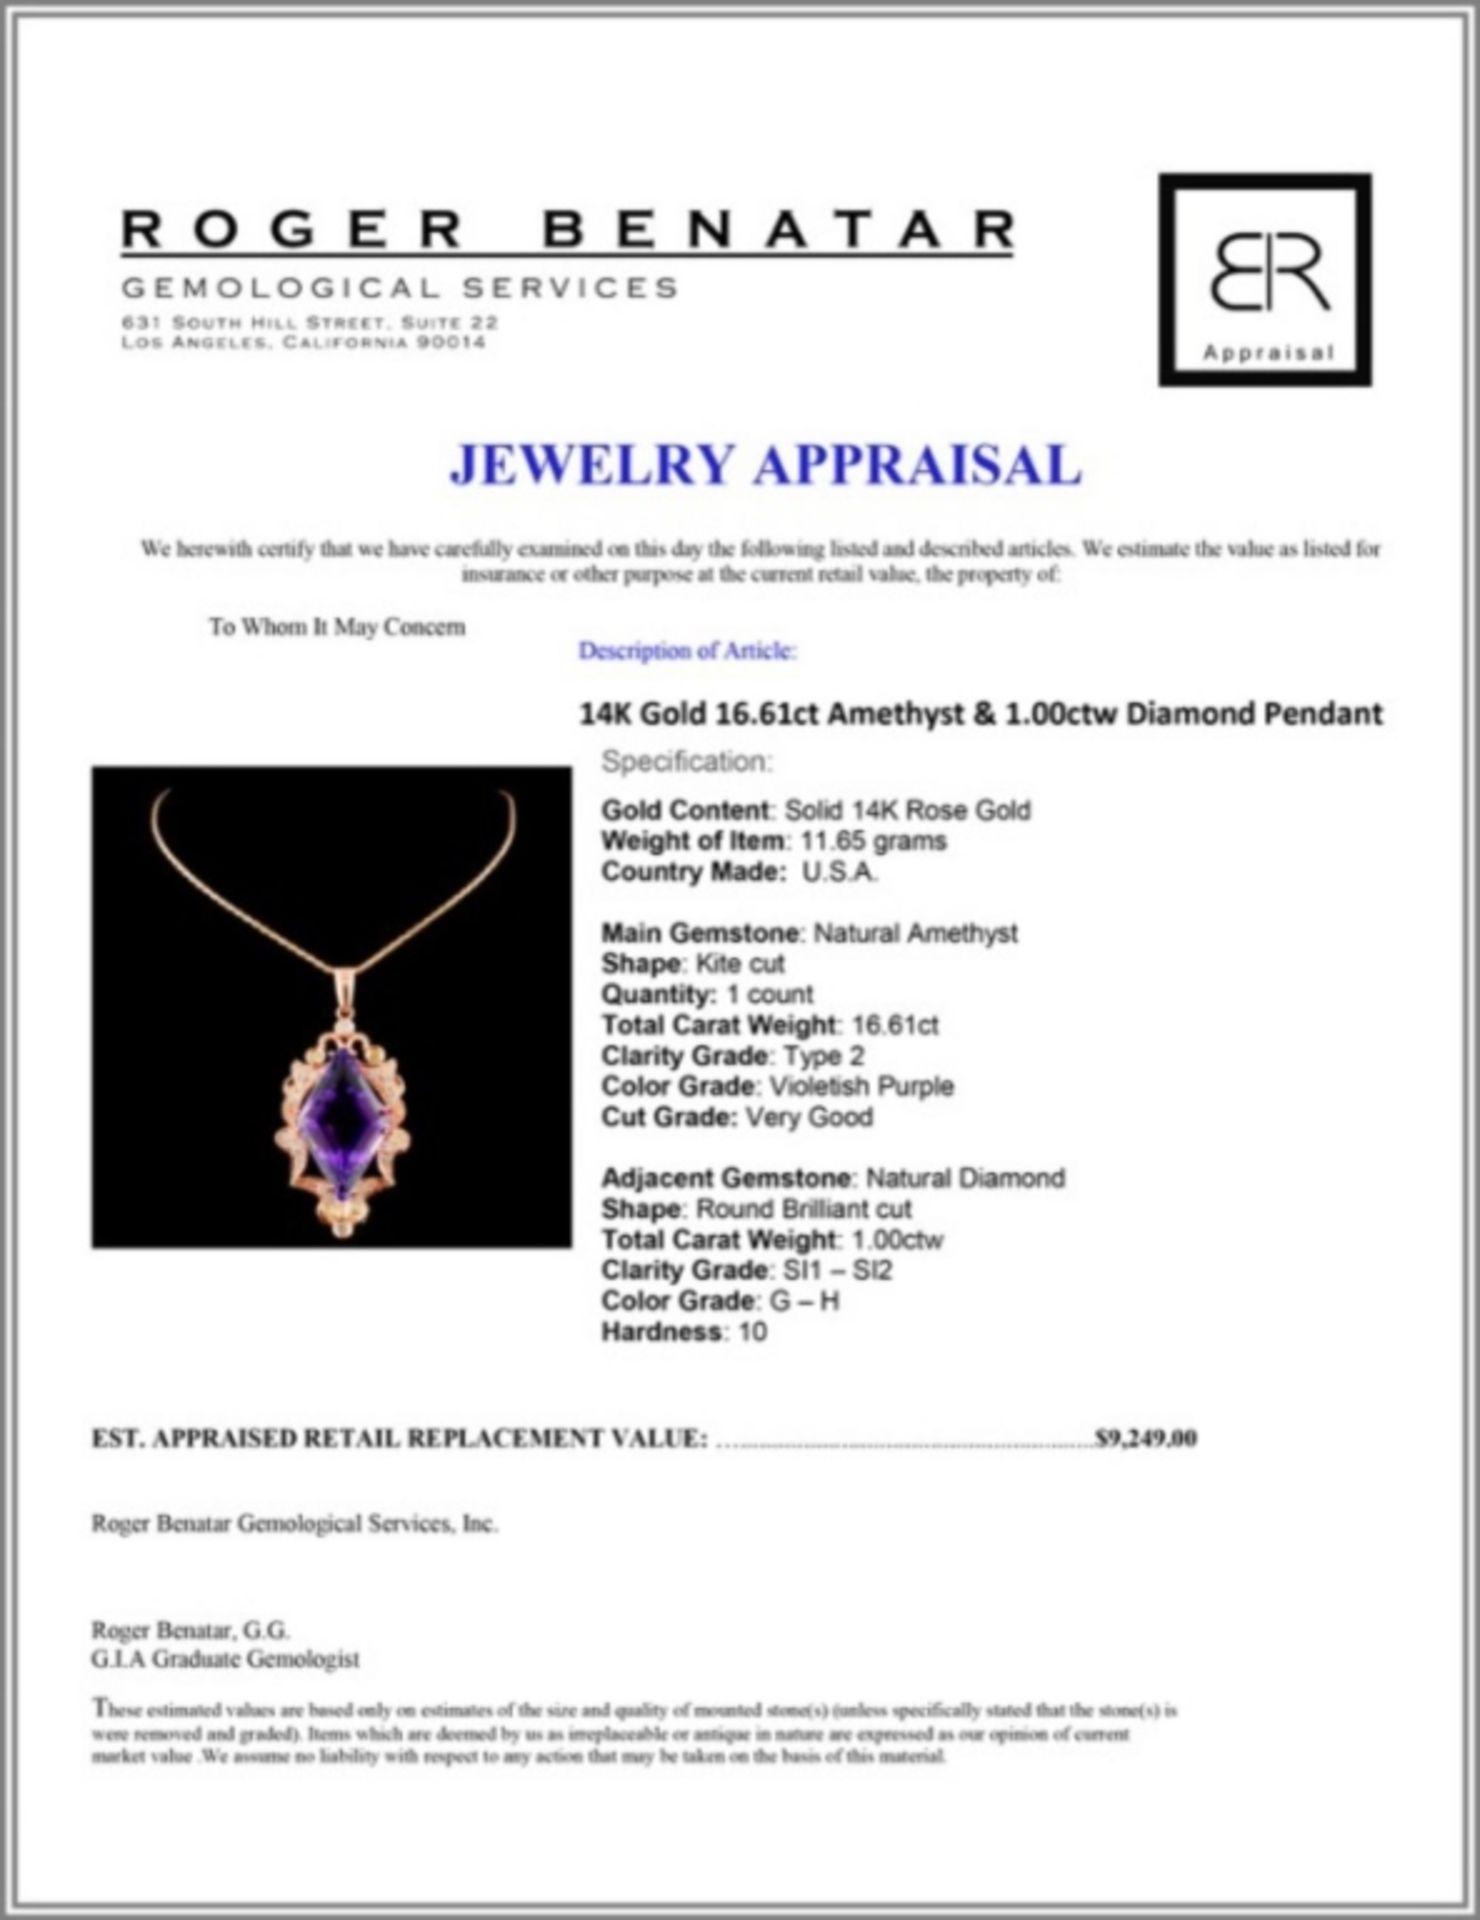 14K Gold 16.61ct Amethyst & 1.00ctw Diamond Pendan - Image 3 of 3